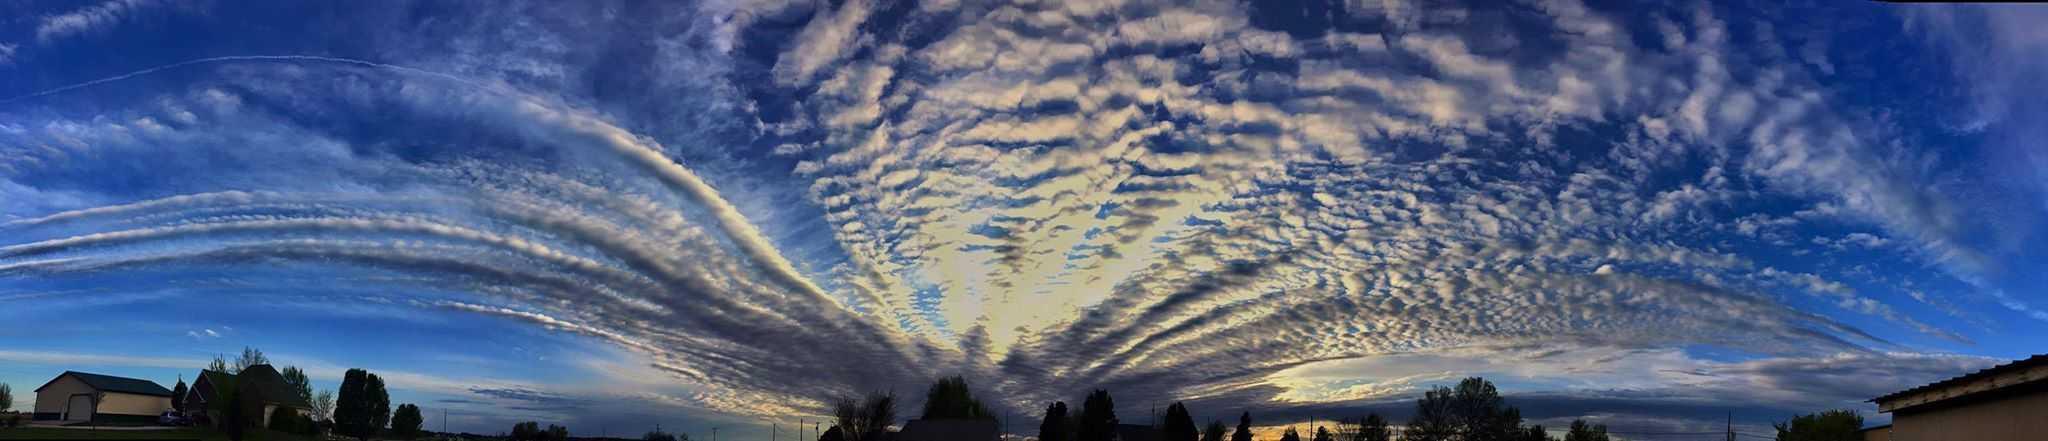 Tonight's Southwest Missouri sunset.